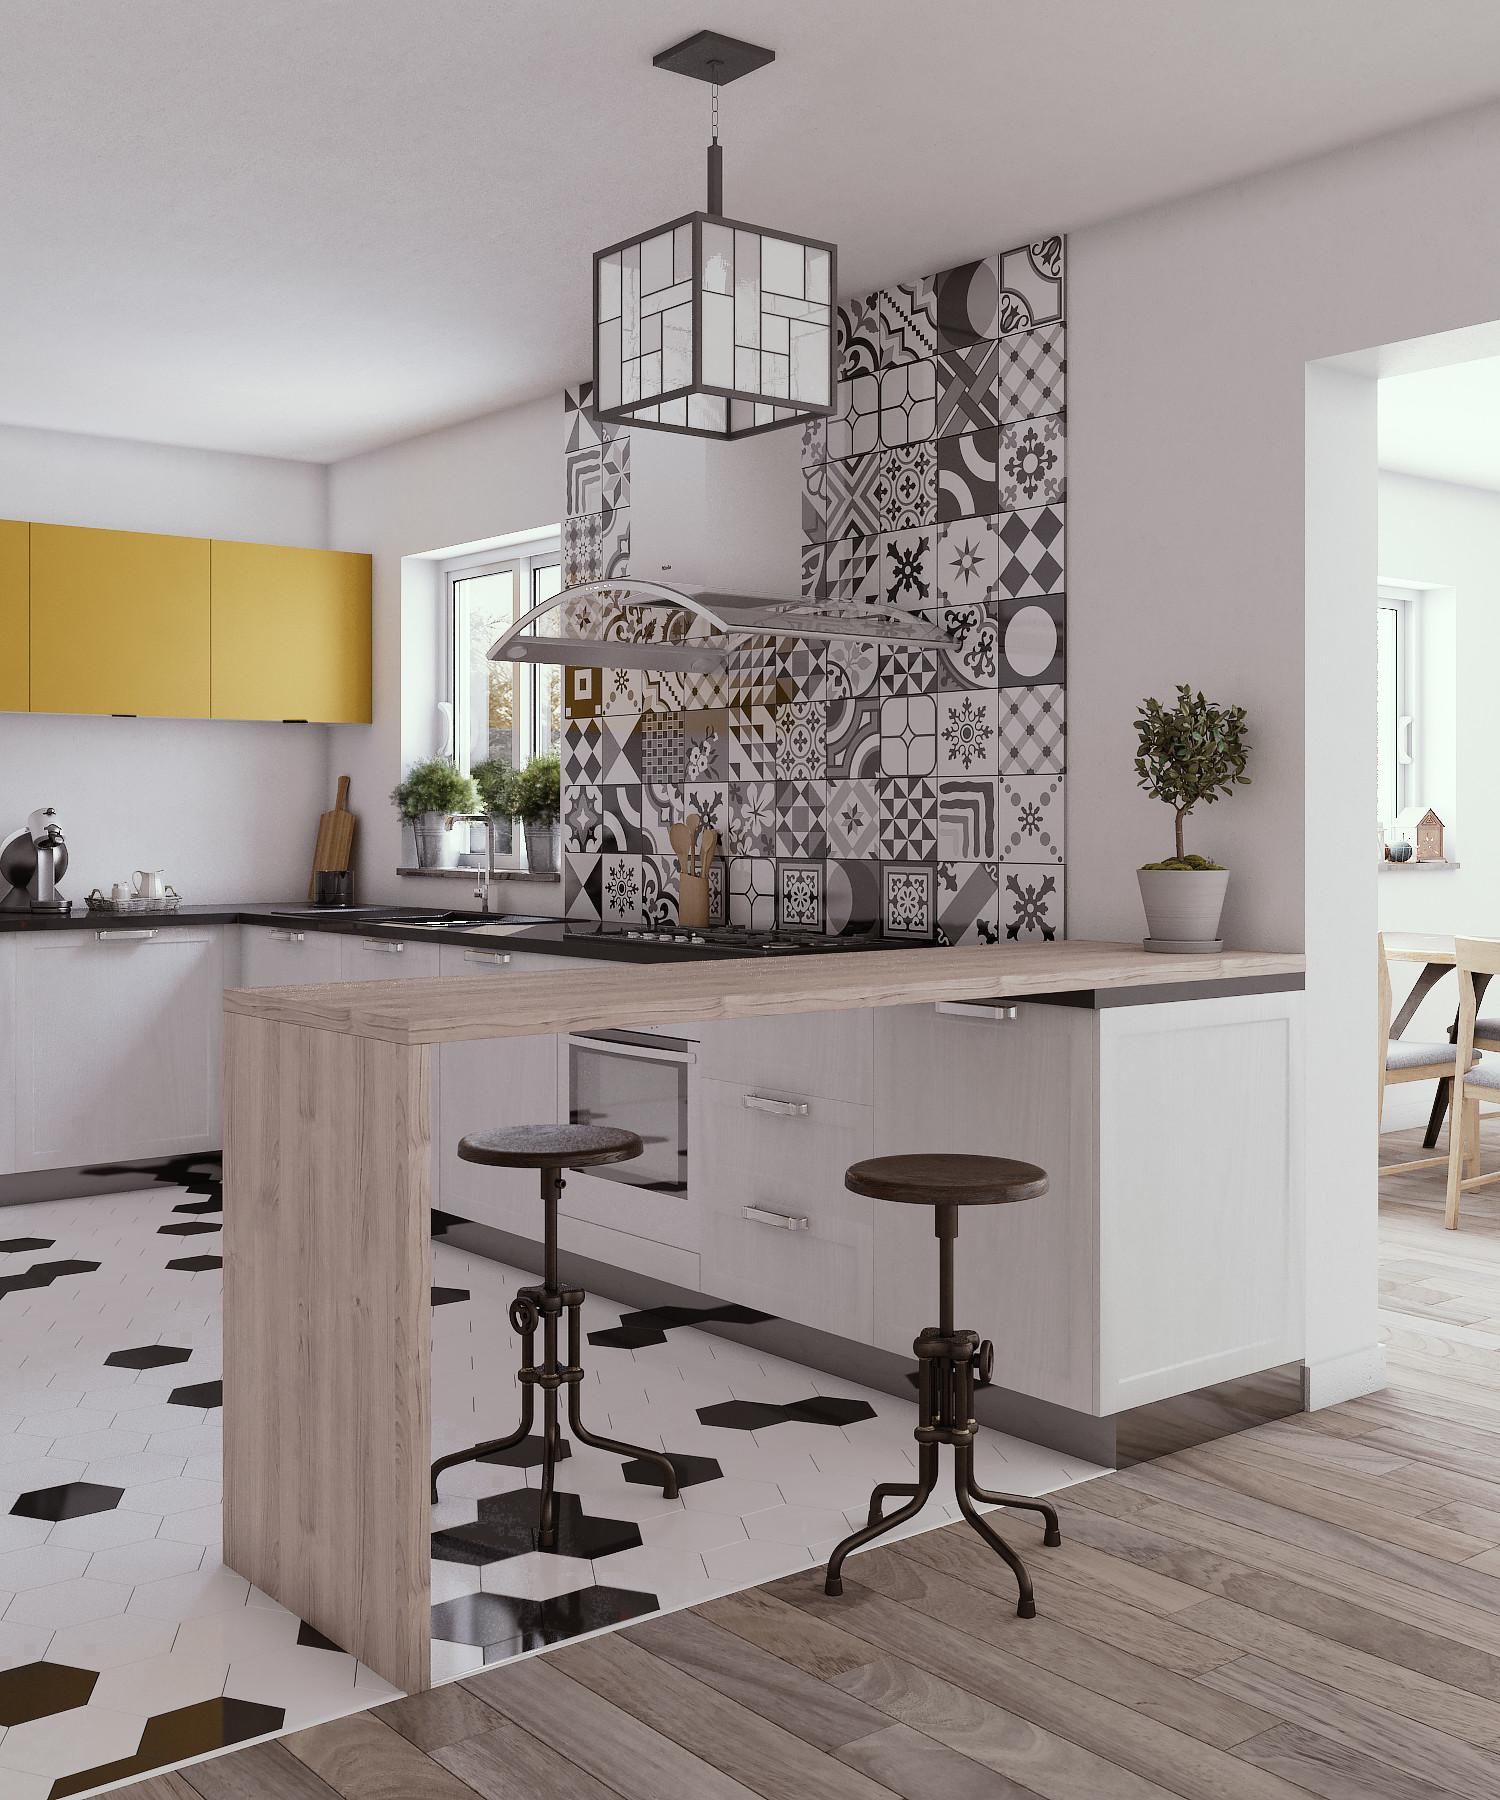 Francois bethermin kitchen01